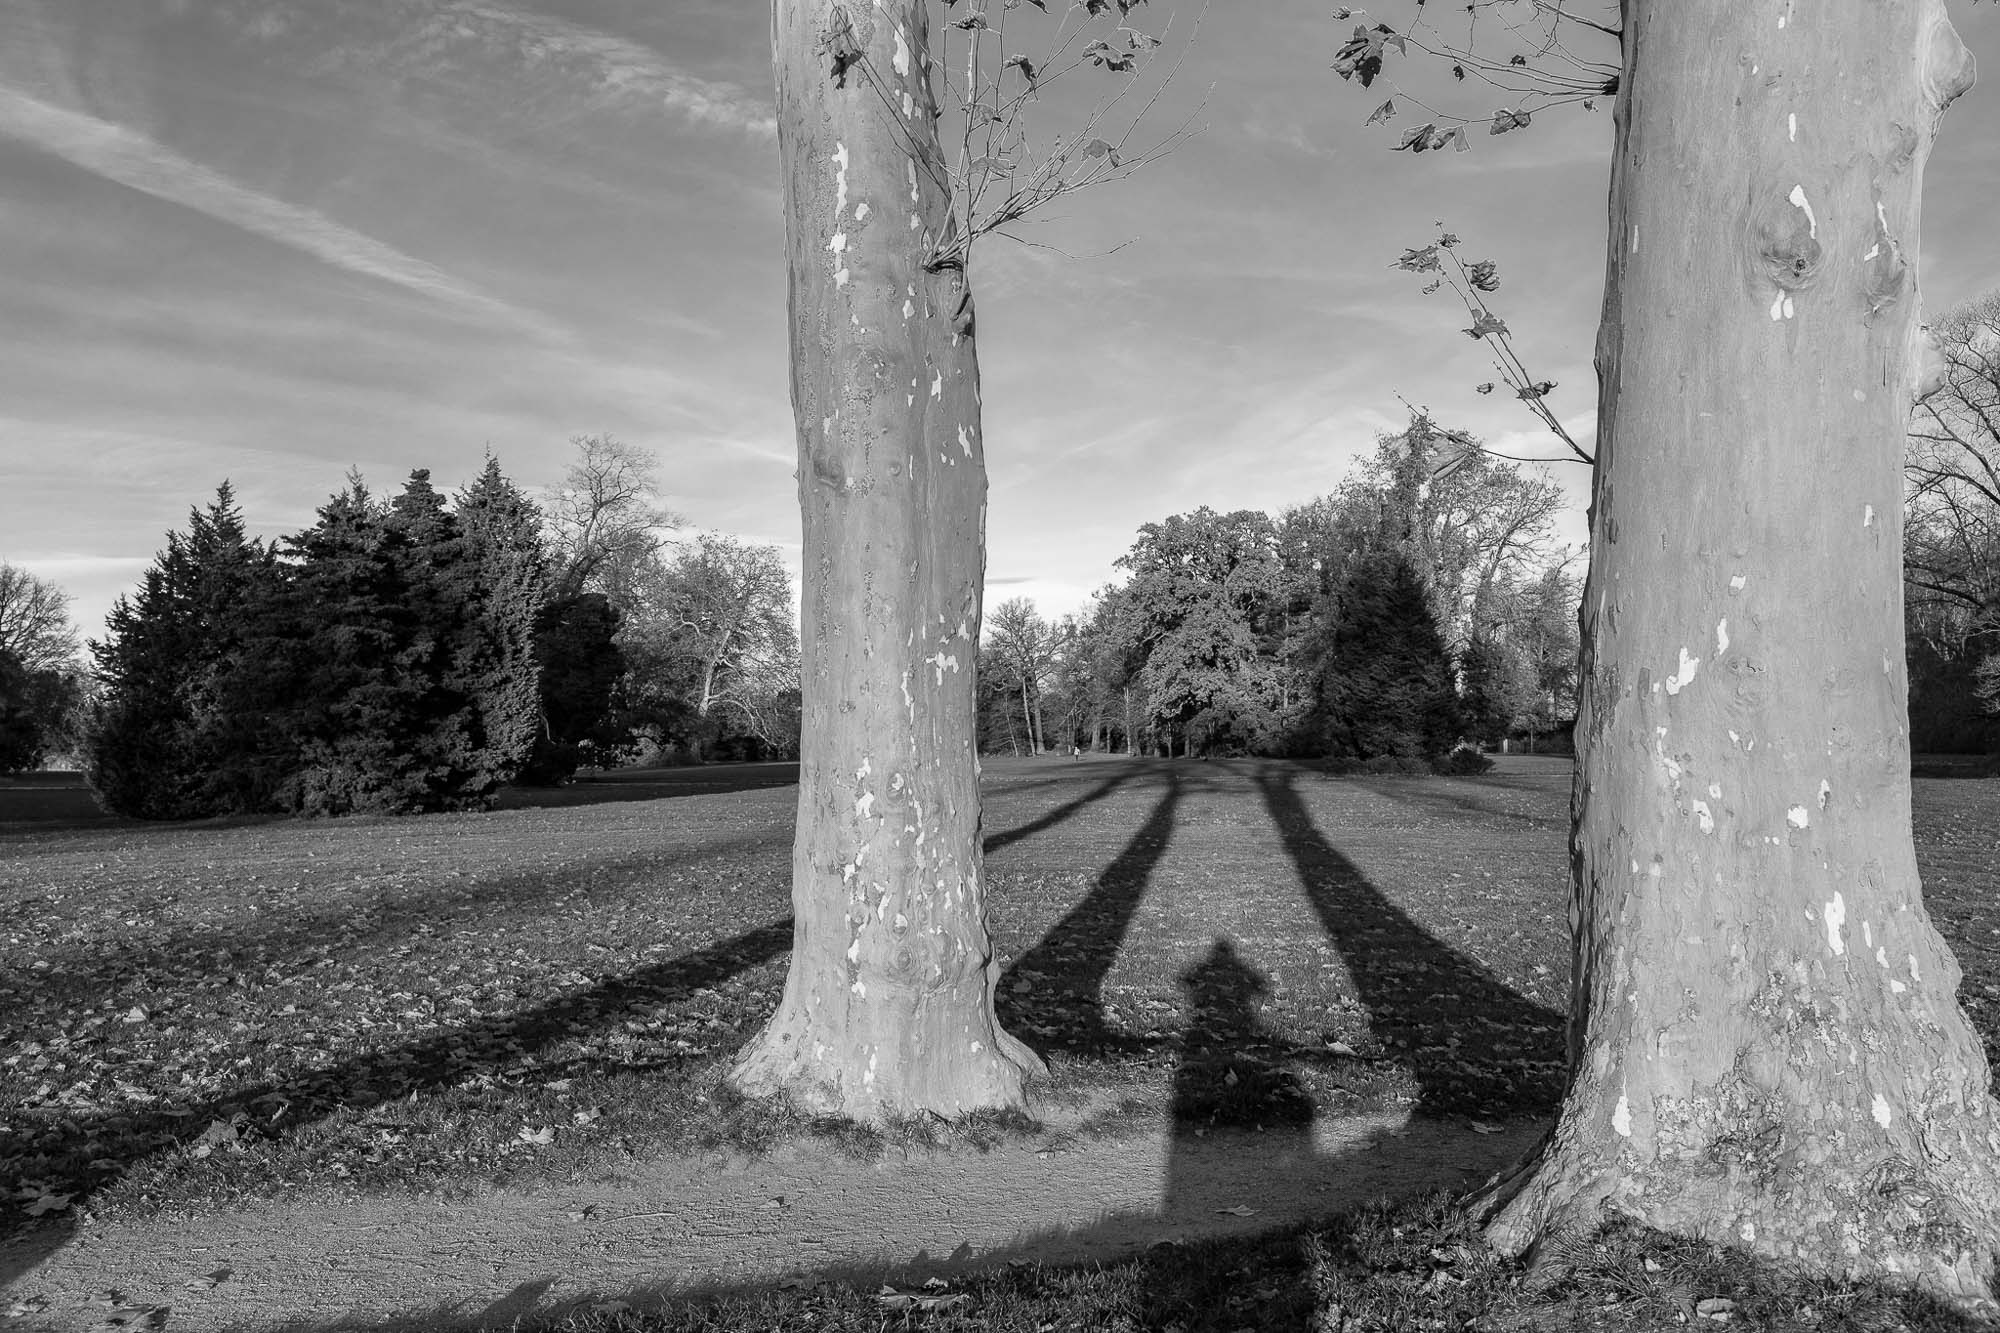 Baum Schatten